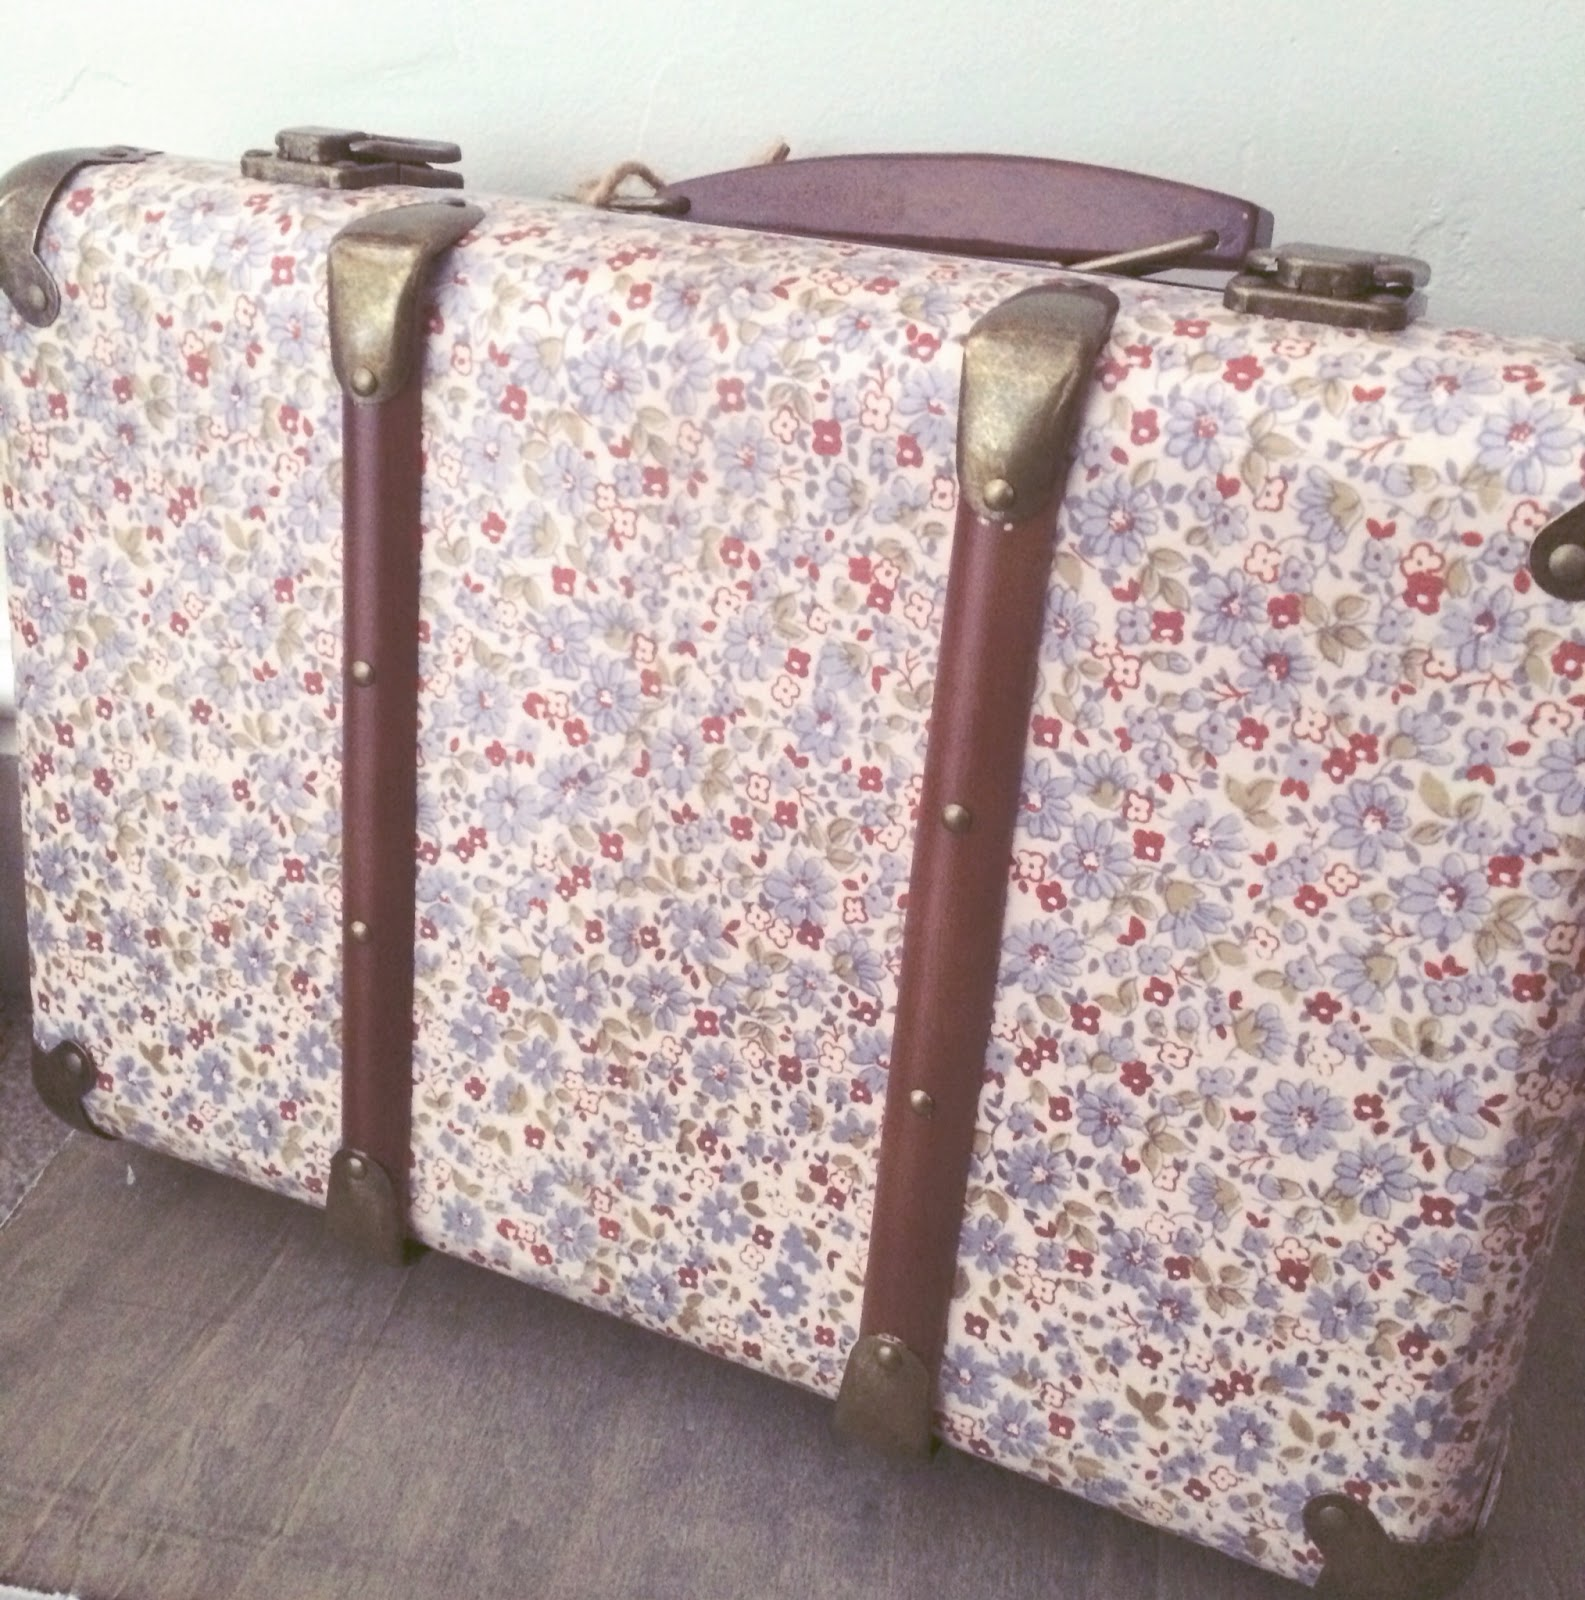 http://lovehijab.tictail.com/product/vintage-mini-blue-daisy-suitcase